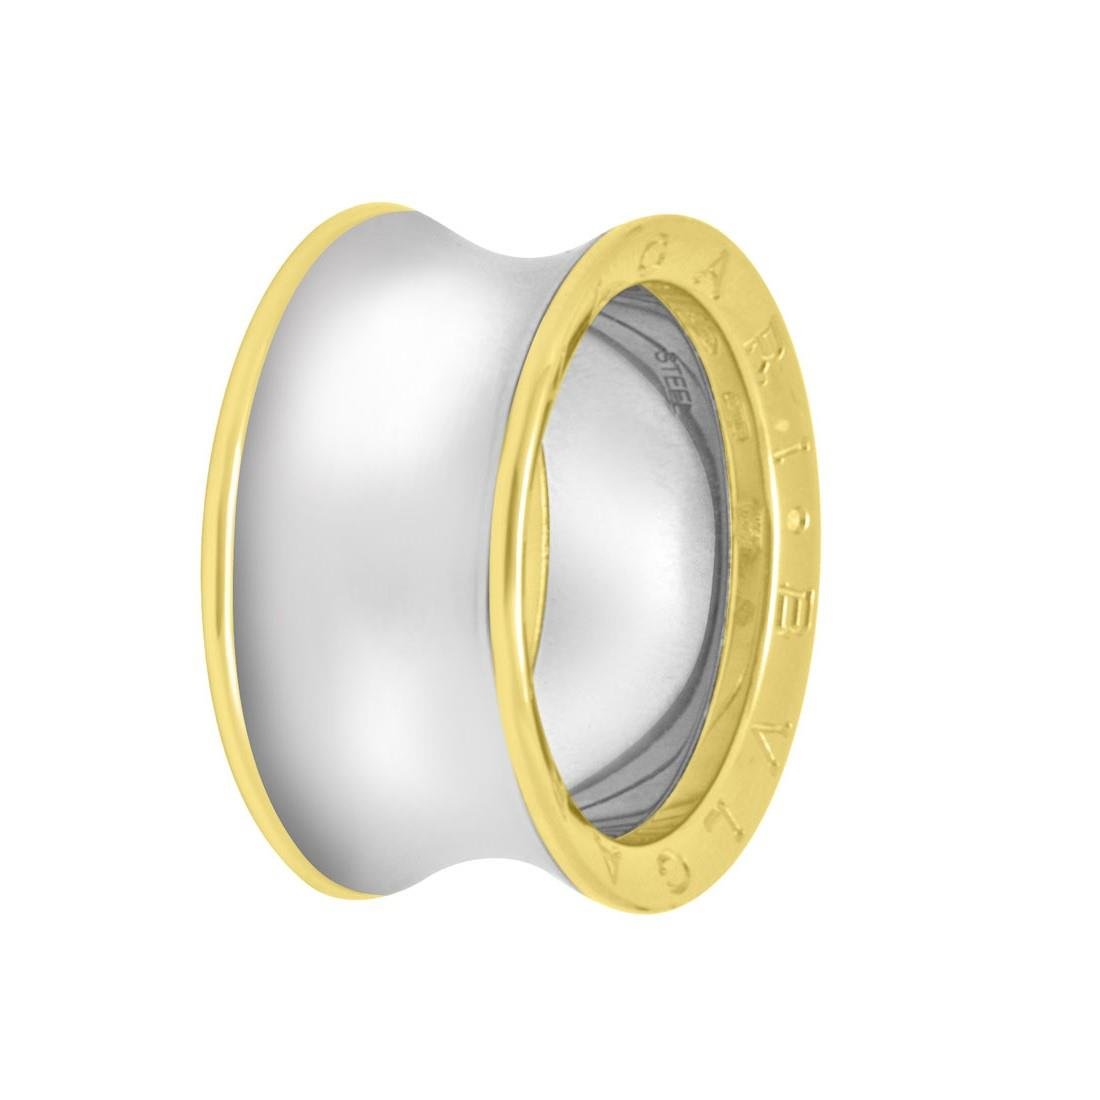 Anello in oro giallo 18 kt e acciaio, misura 20 - BULGARI